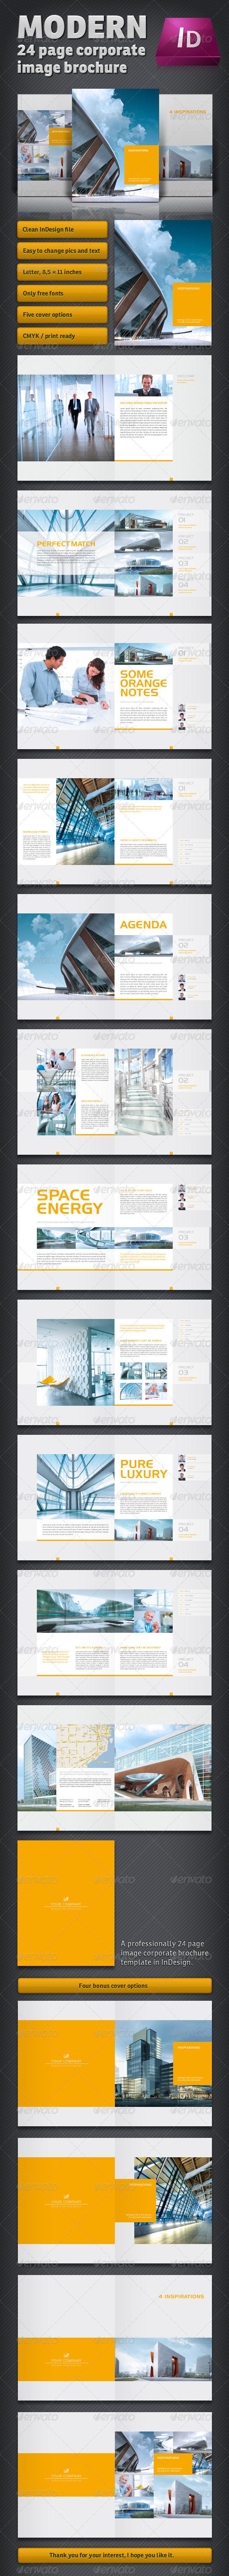 GraphicRiver Modern Brochure 2654666